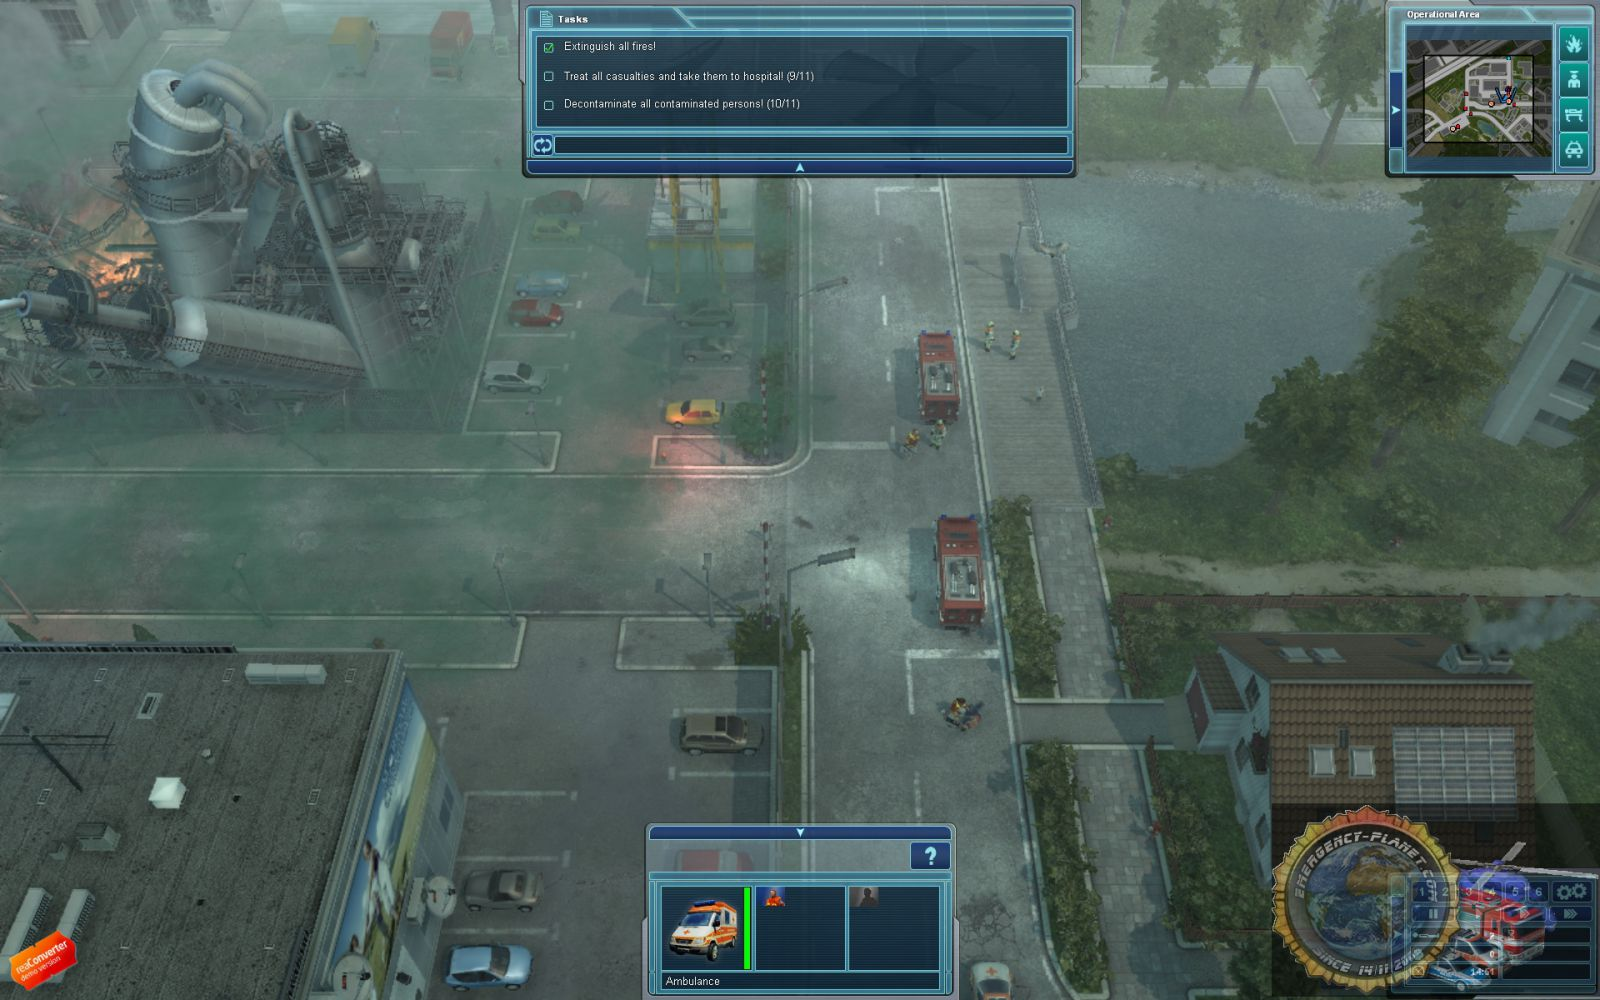 Emergency 2014 Screenshot 18